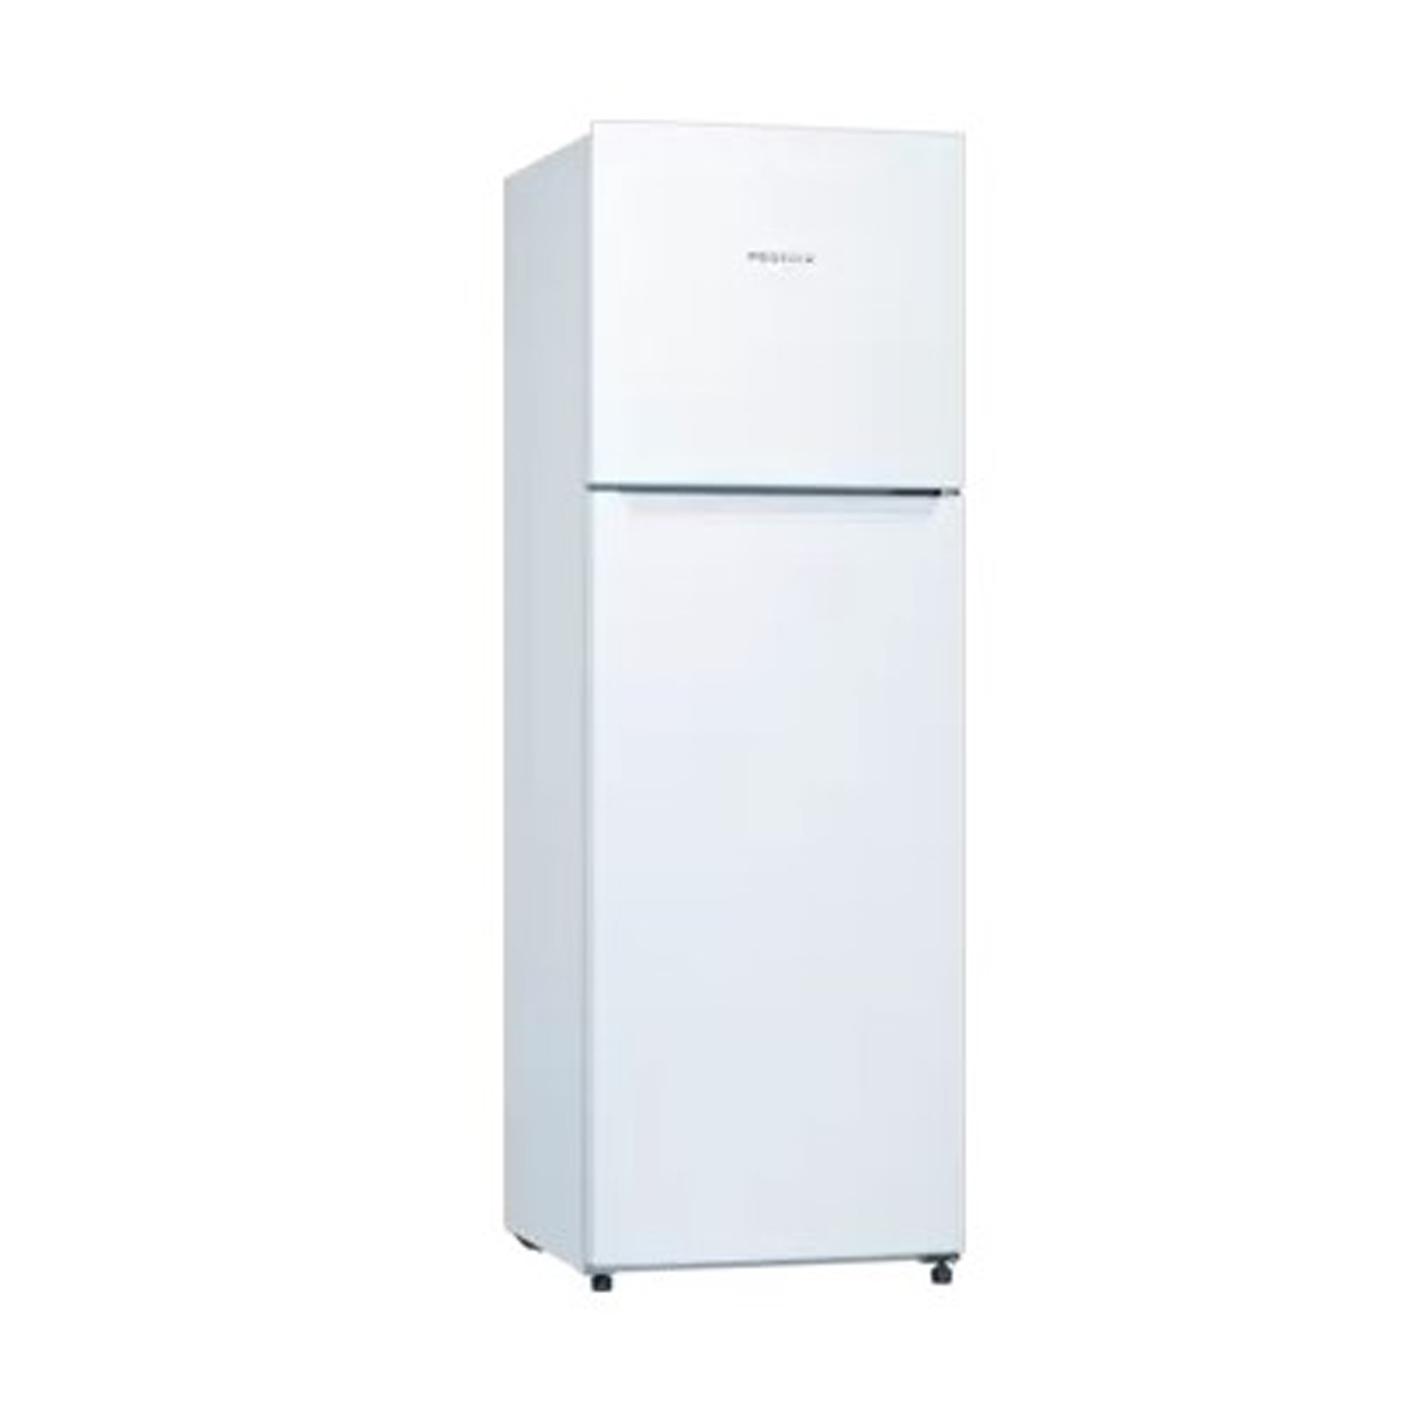 Profilo BD2028W2NN No-Frost Buzdolabı Comfort Serisi